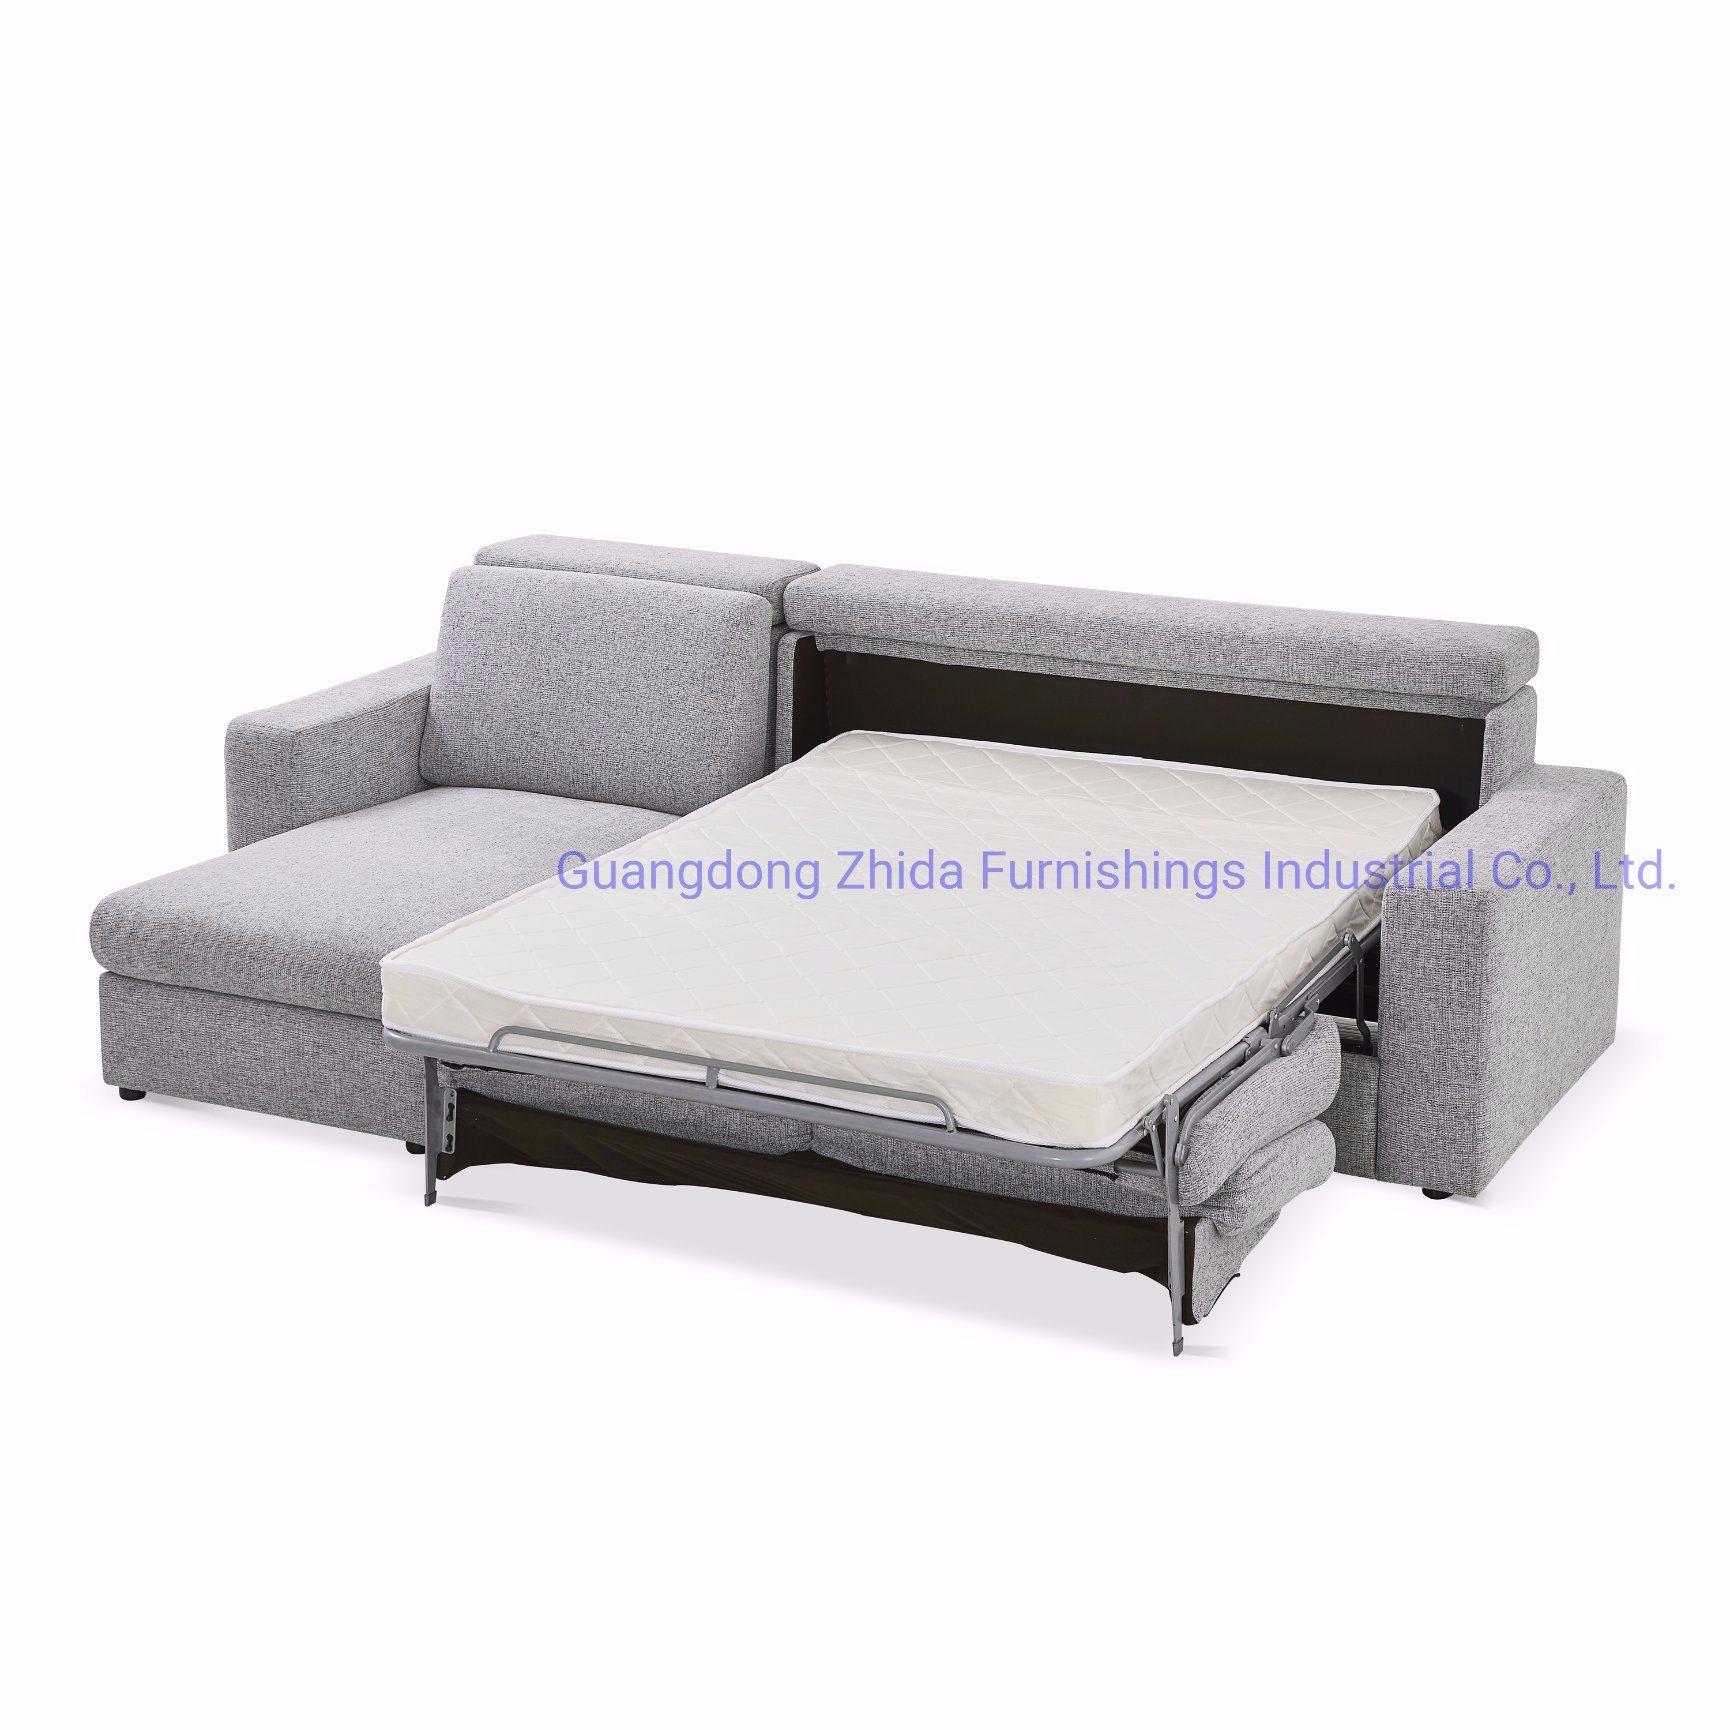 China High Qualtiy Modern Sofa Bed With Storage - China Sofa Bed, Modern Sofa